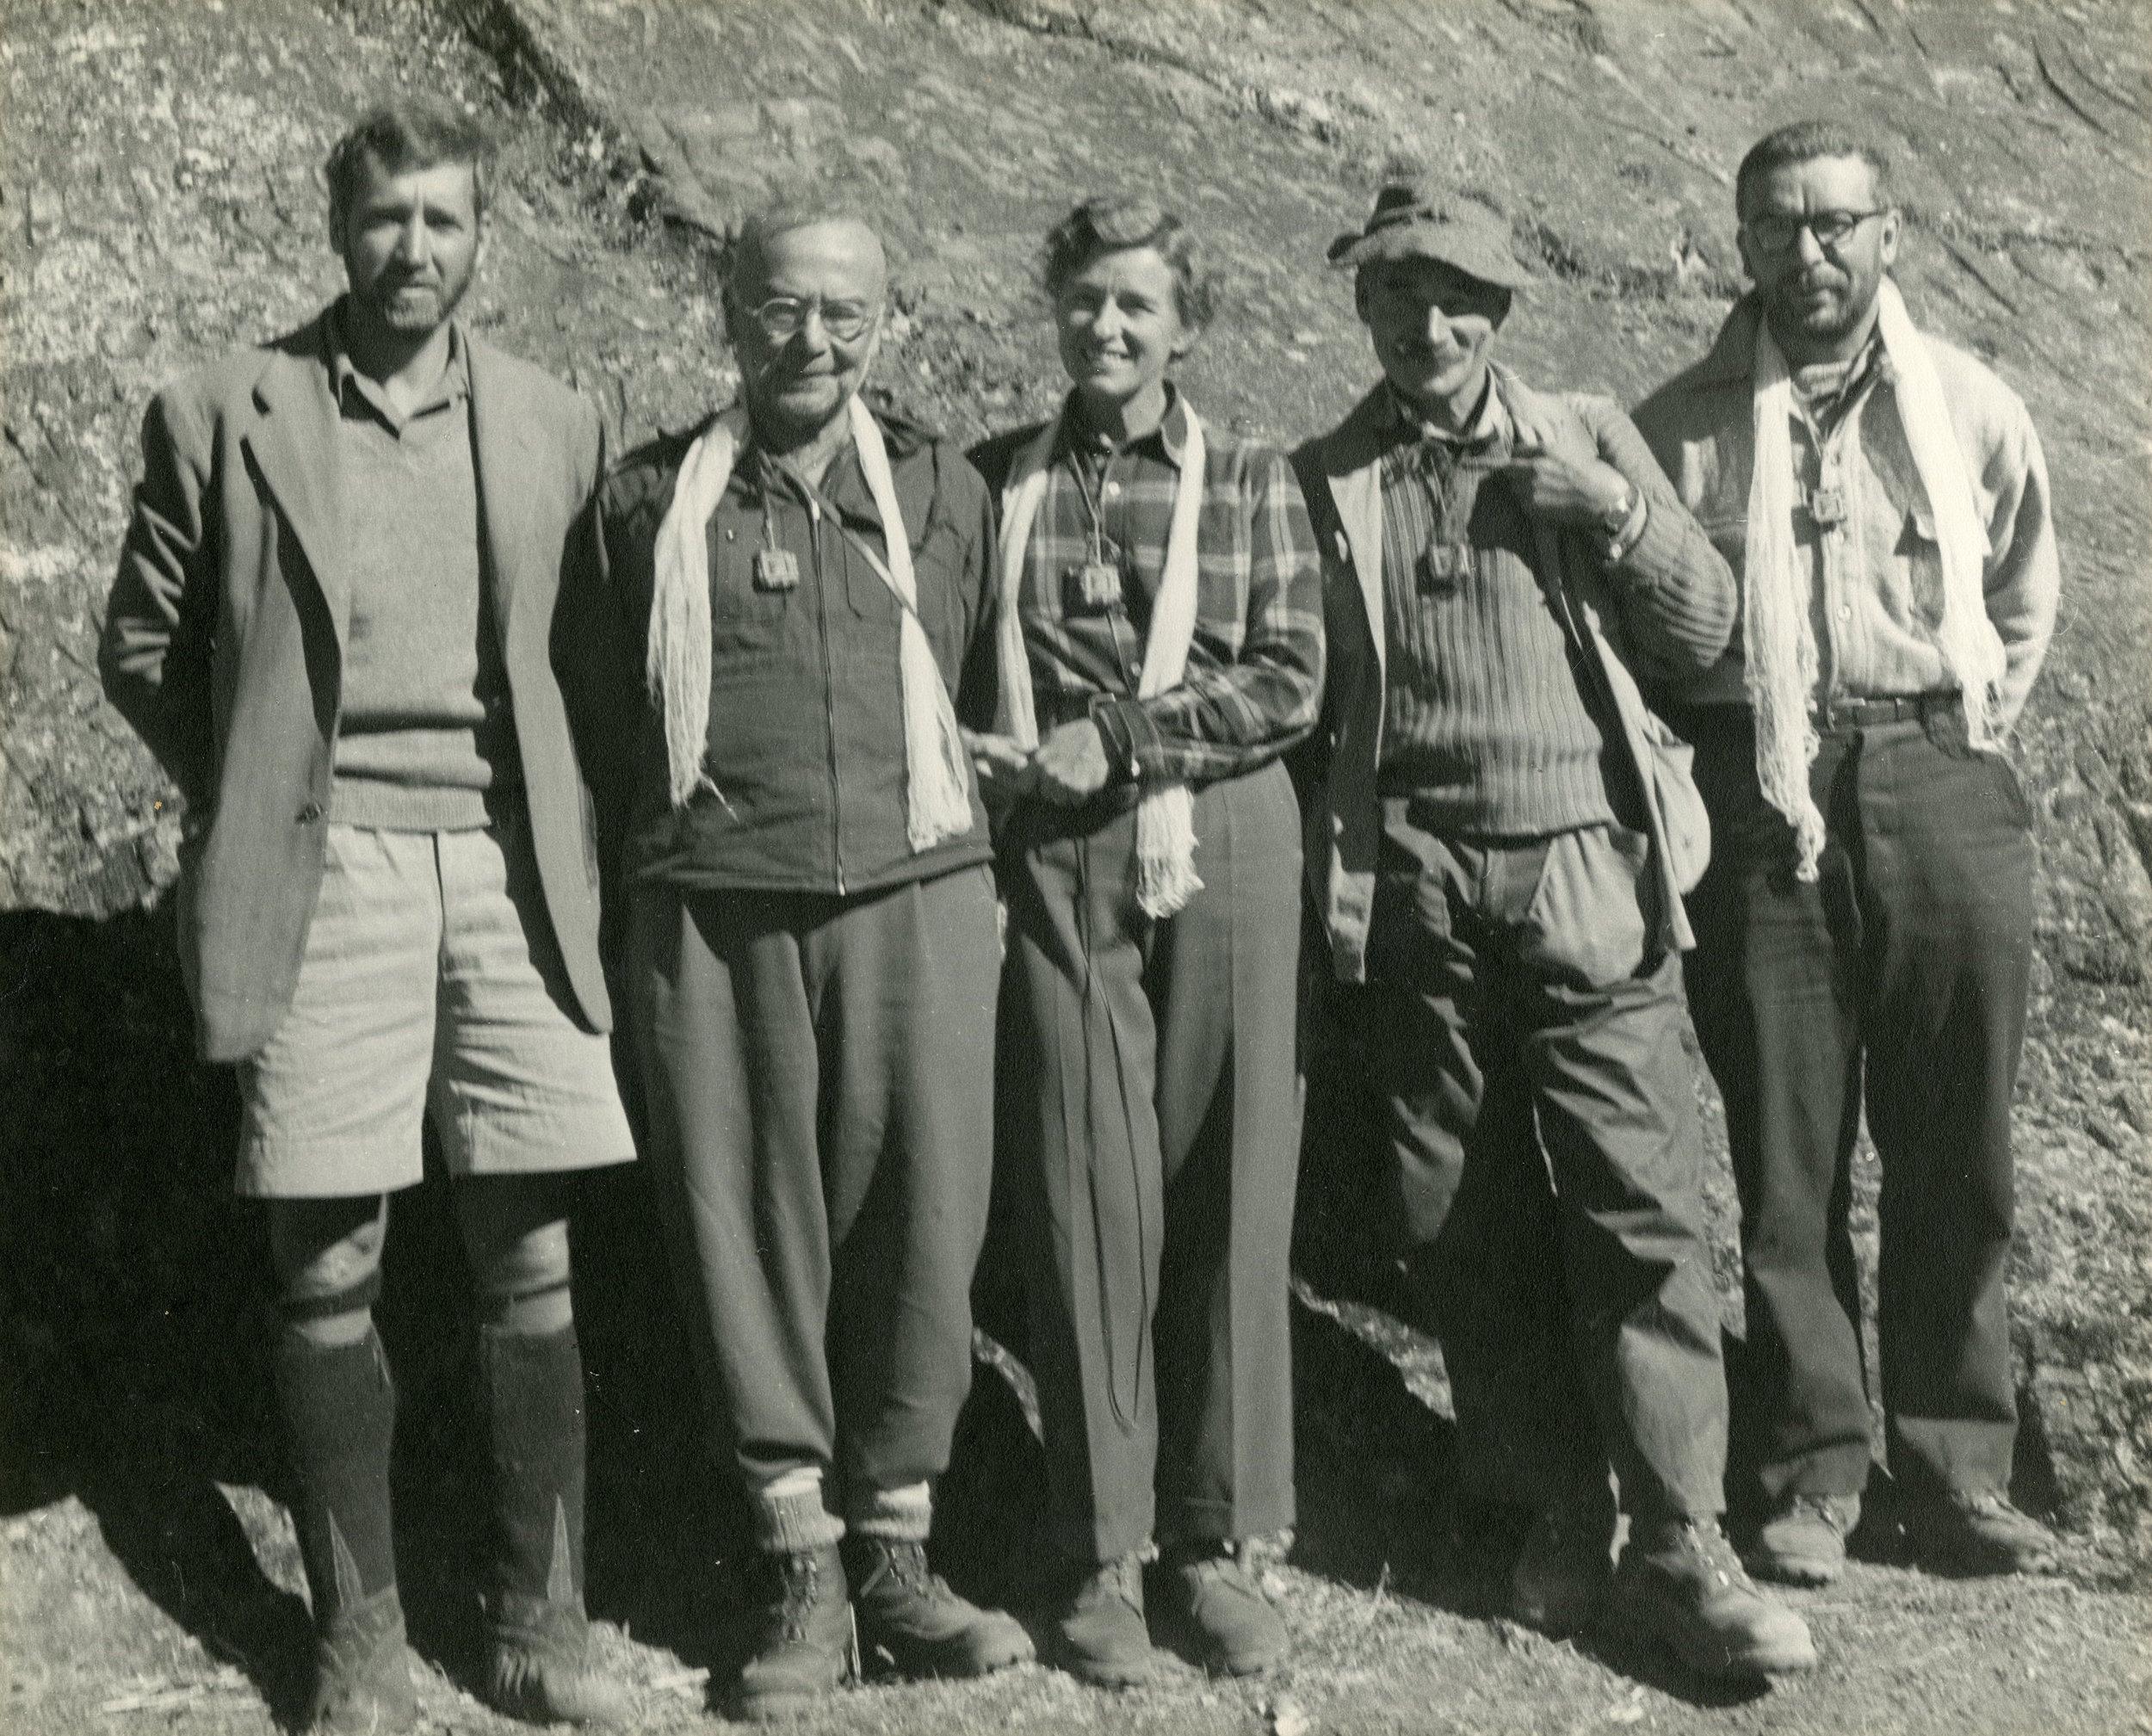 1950 Houston Expedition, Everest Reconnaissance